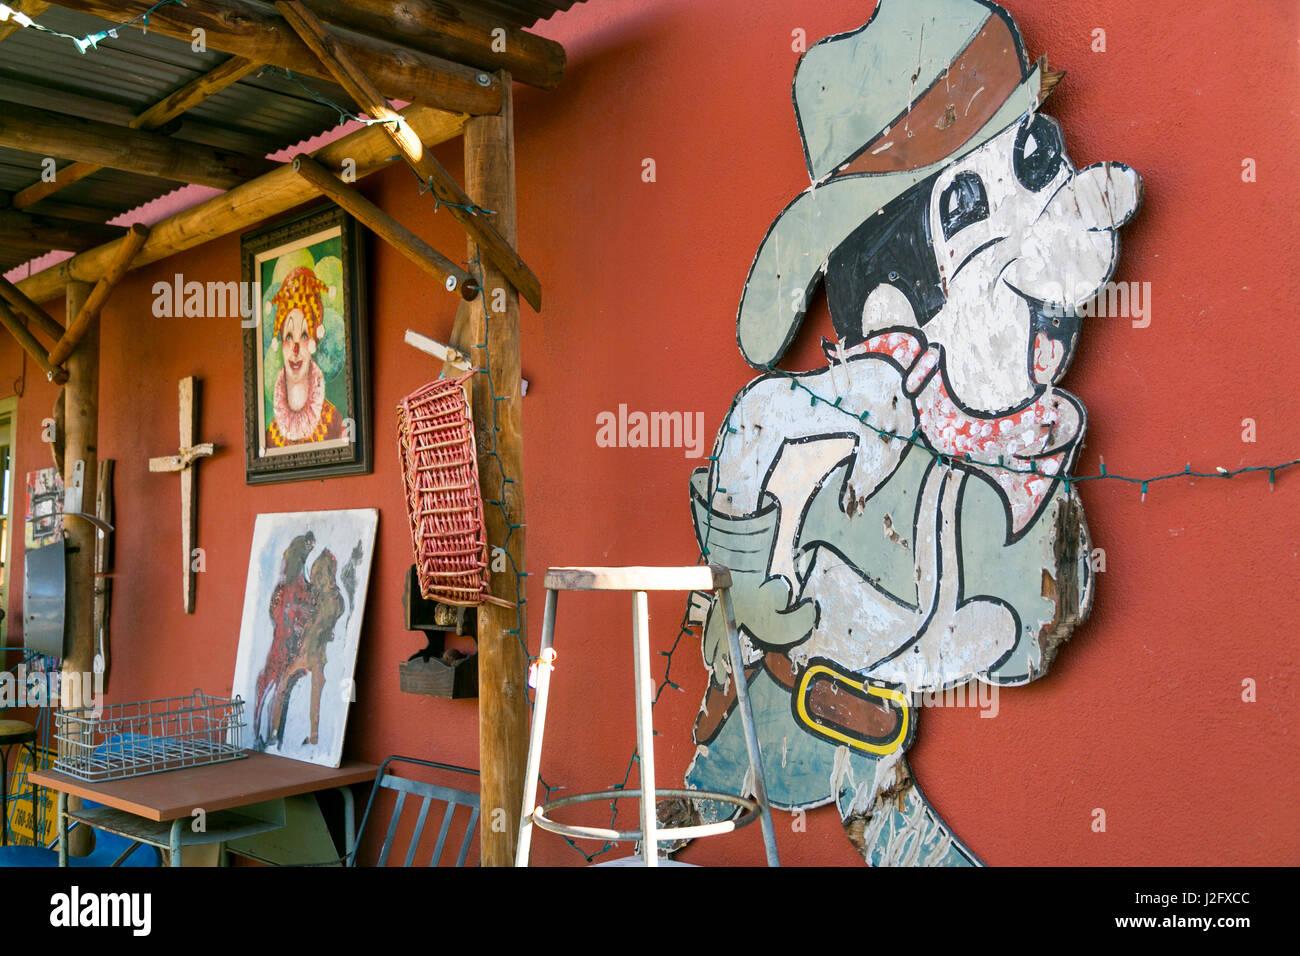 Zerlumpten Cartoon Charakter Zeichen, Joshua Tree, Kalifornien, USA. Stockbild